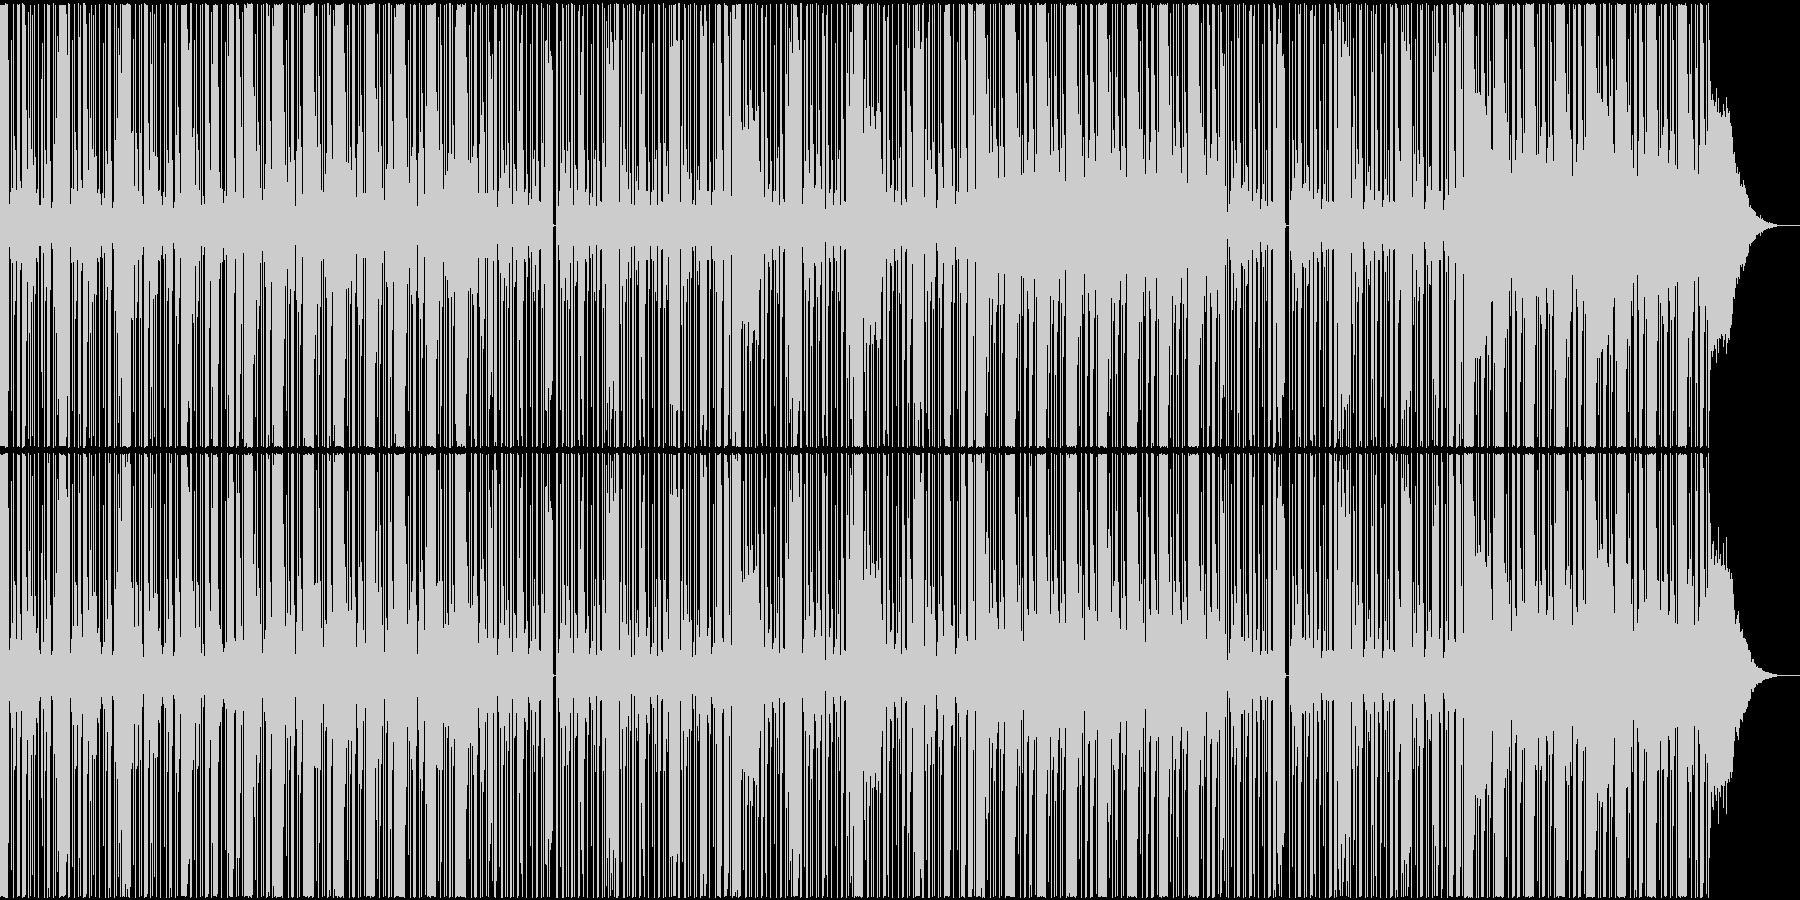 HIPHOP R&B ニューヨーク90sの未再生の波形